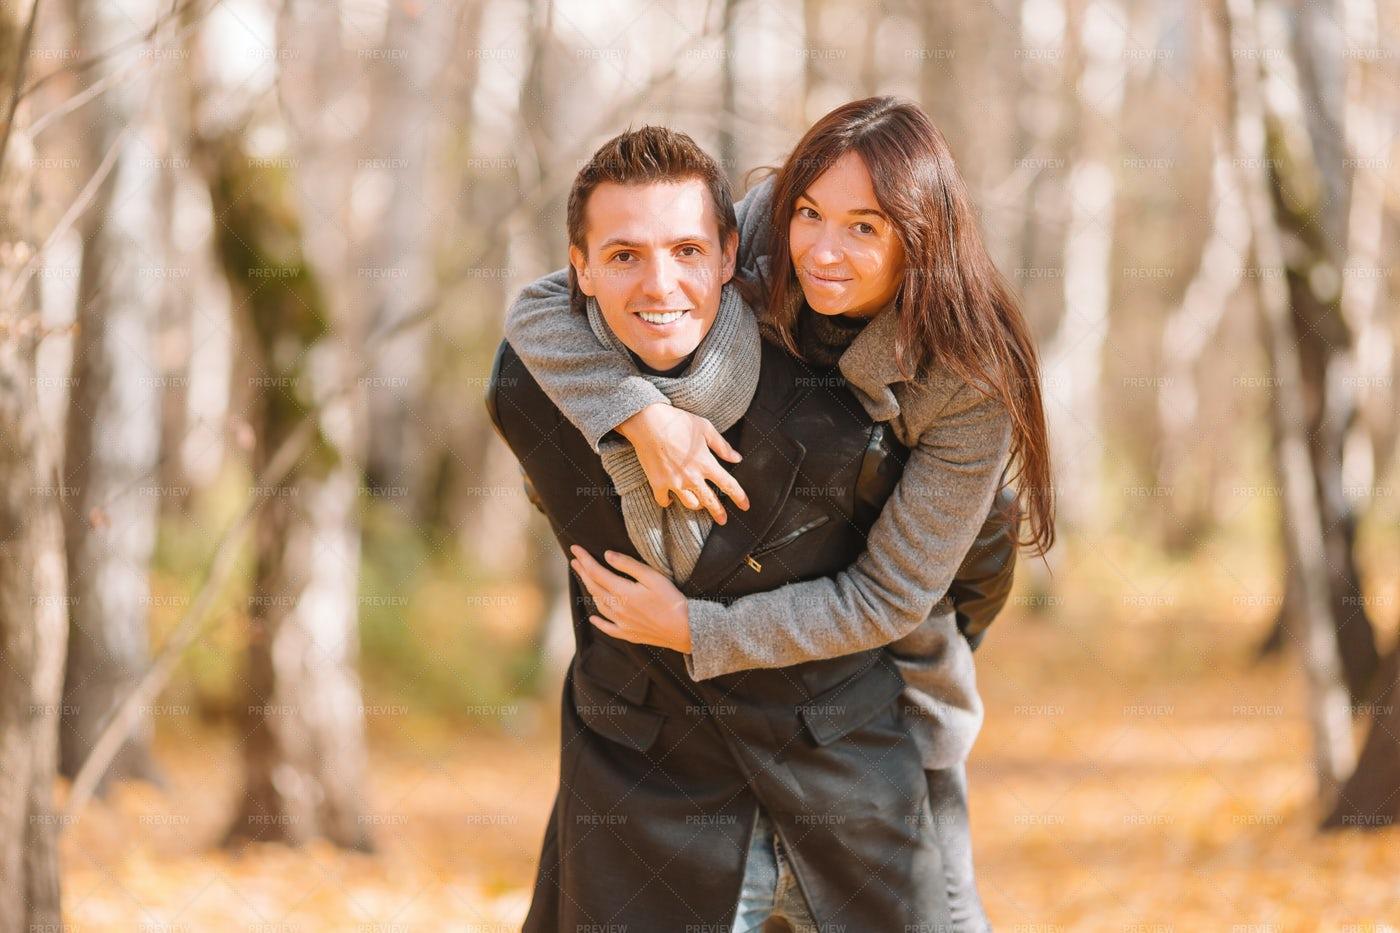 Man Carries Girlfriend: Stock Photos